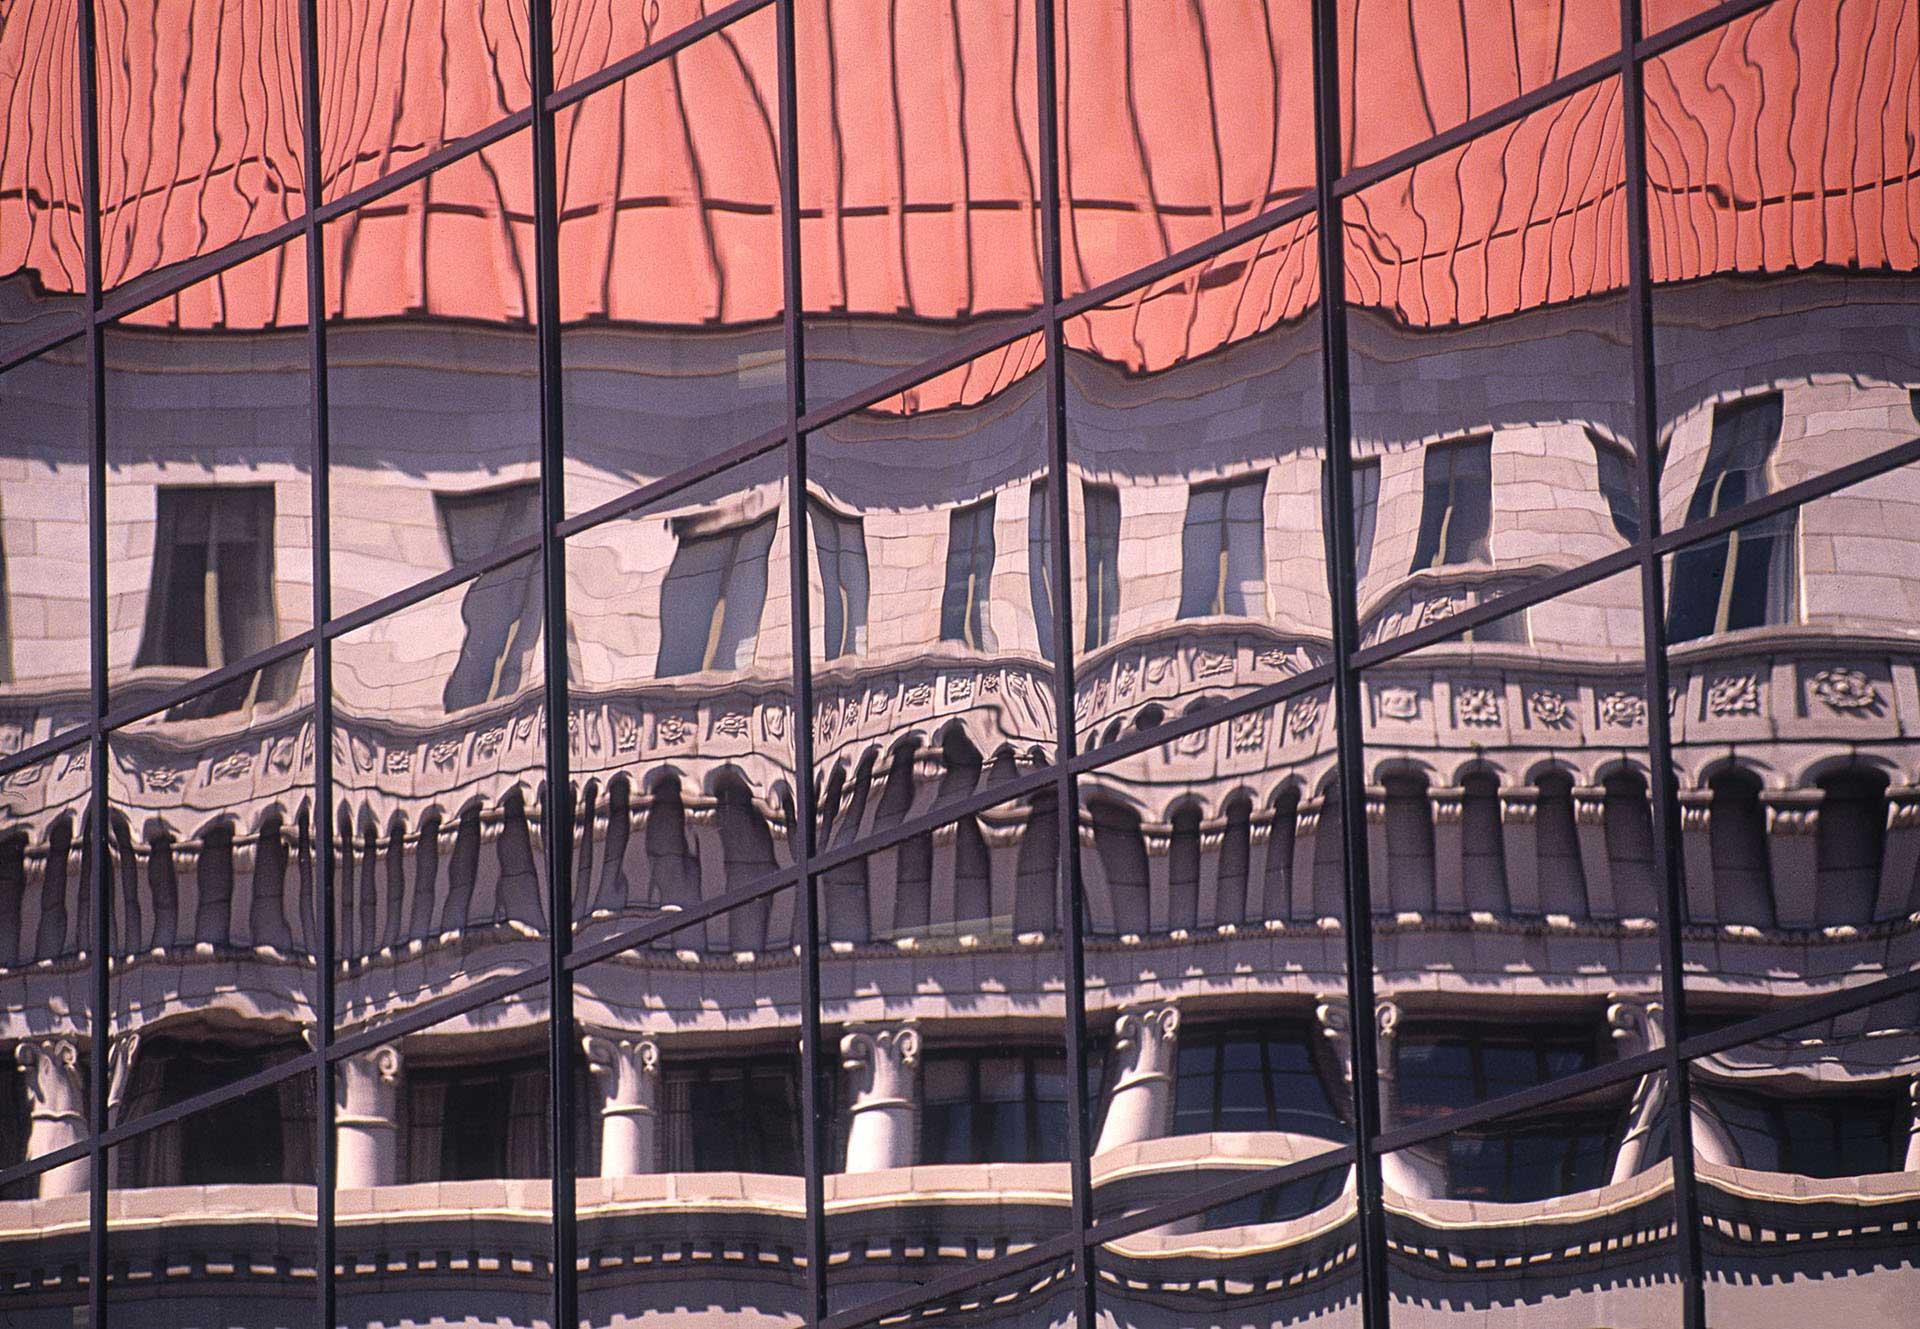 architecture-exterior-building-reflection_w